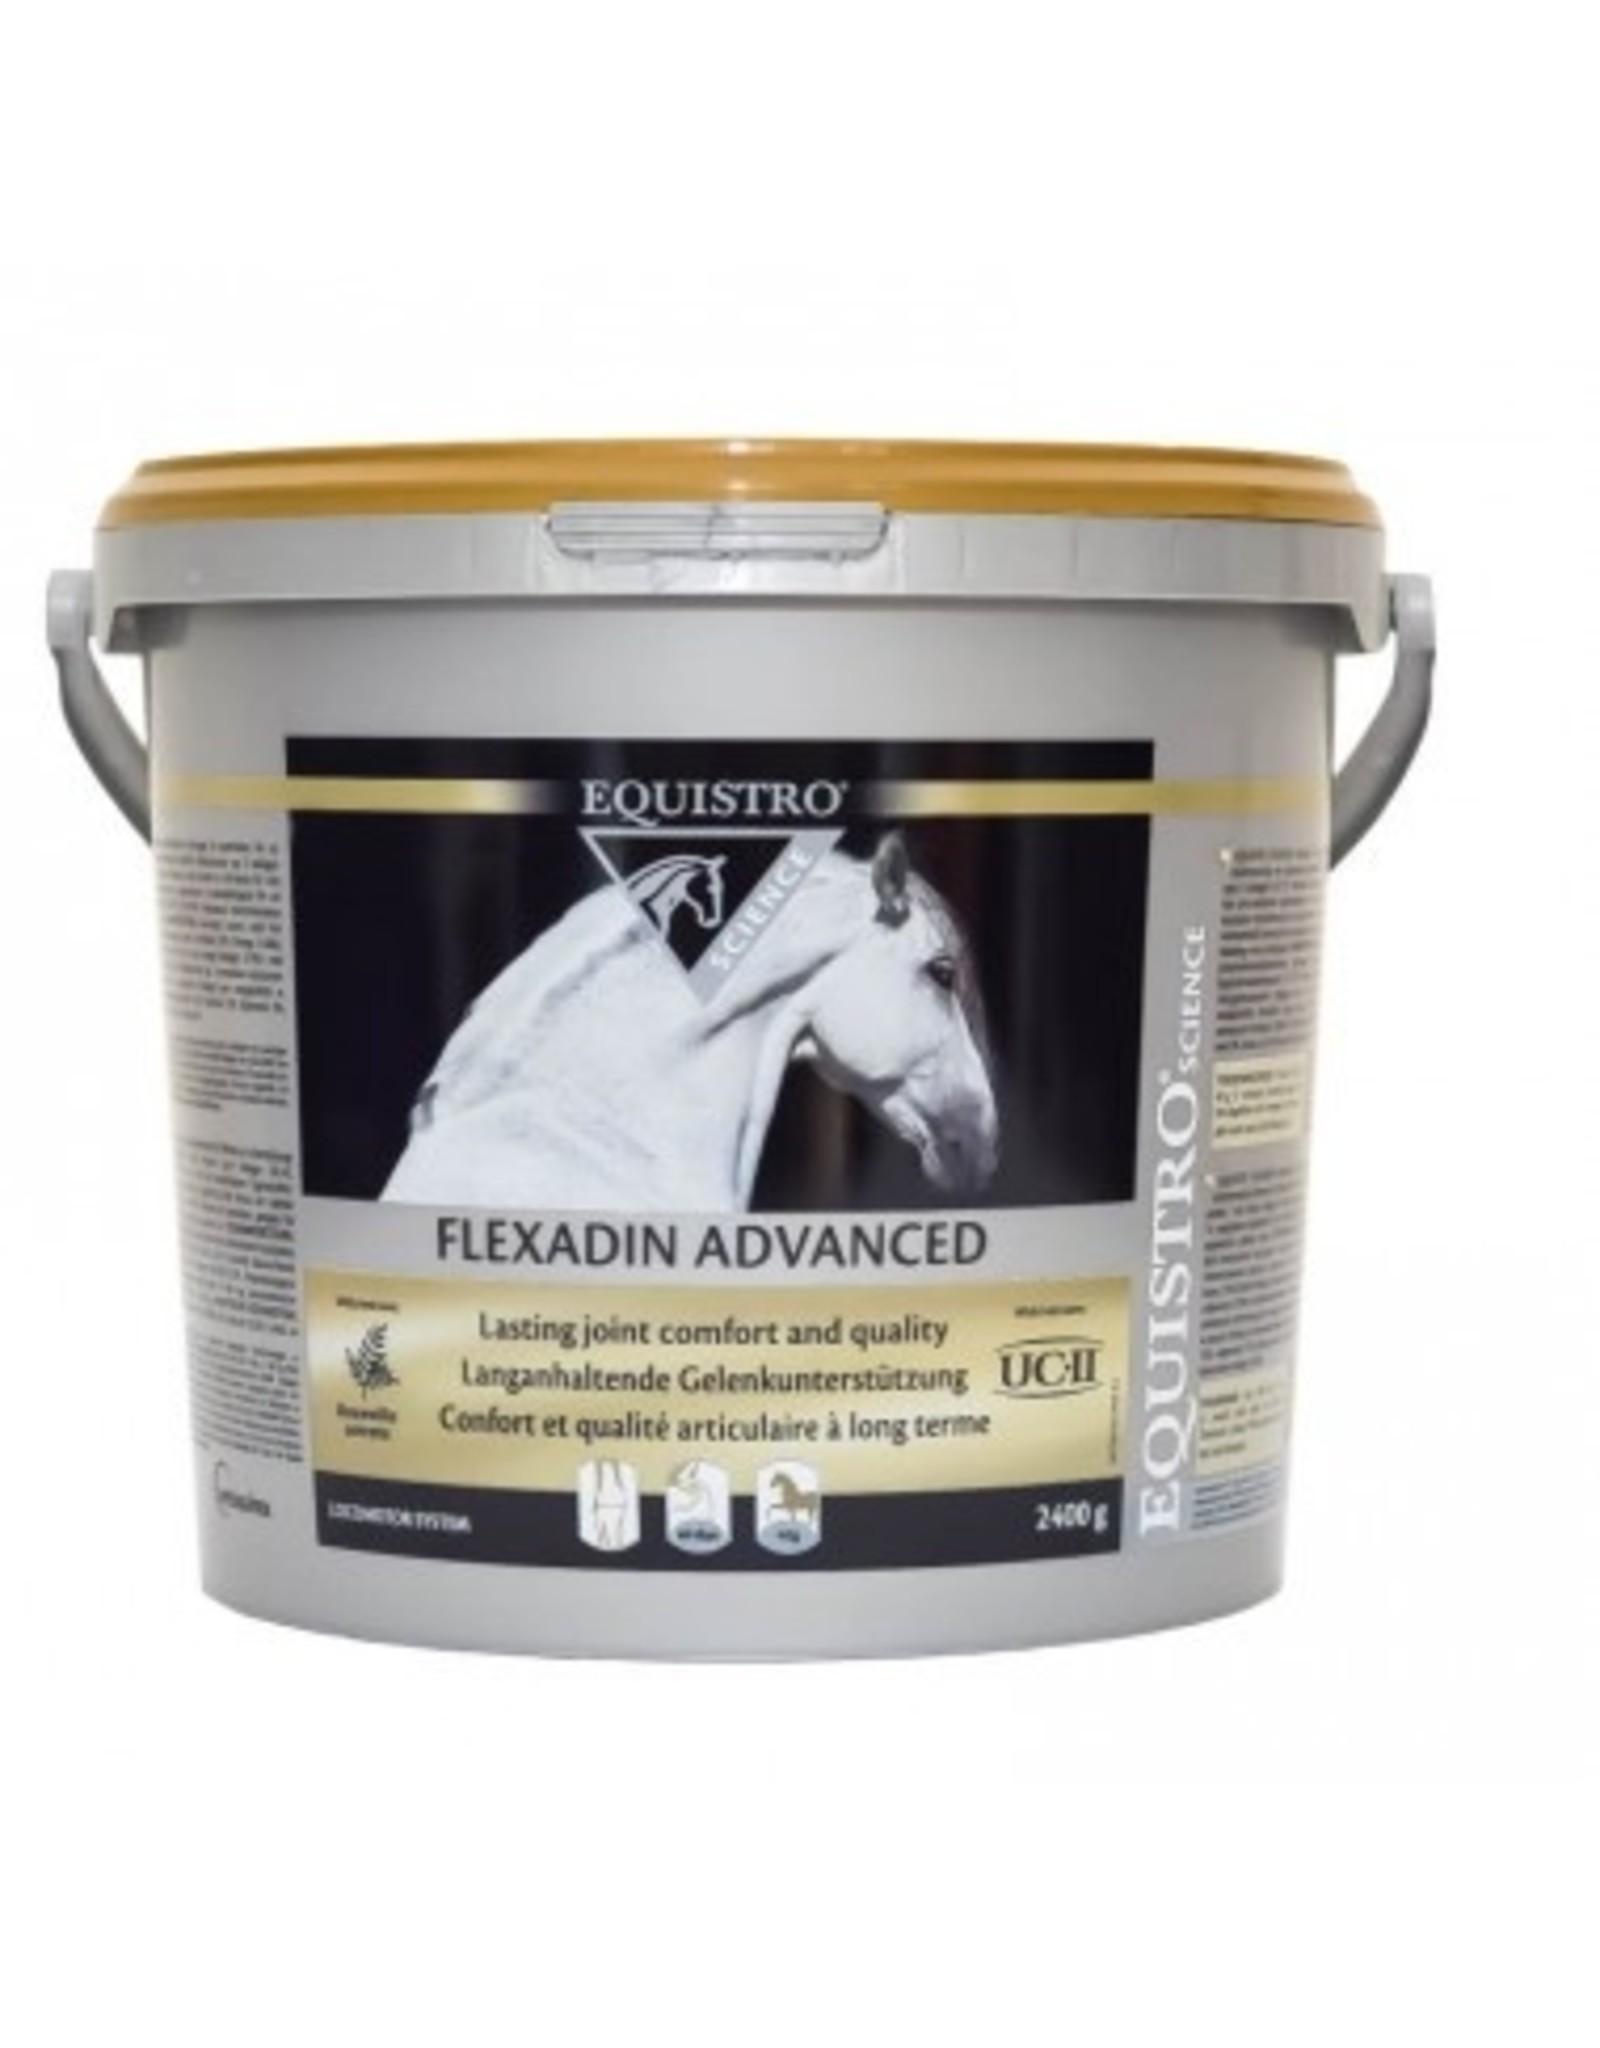 Equistro FLEXADIN ADVANCED 2.4 KG